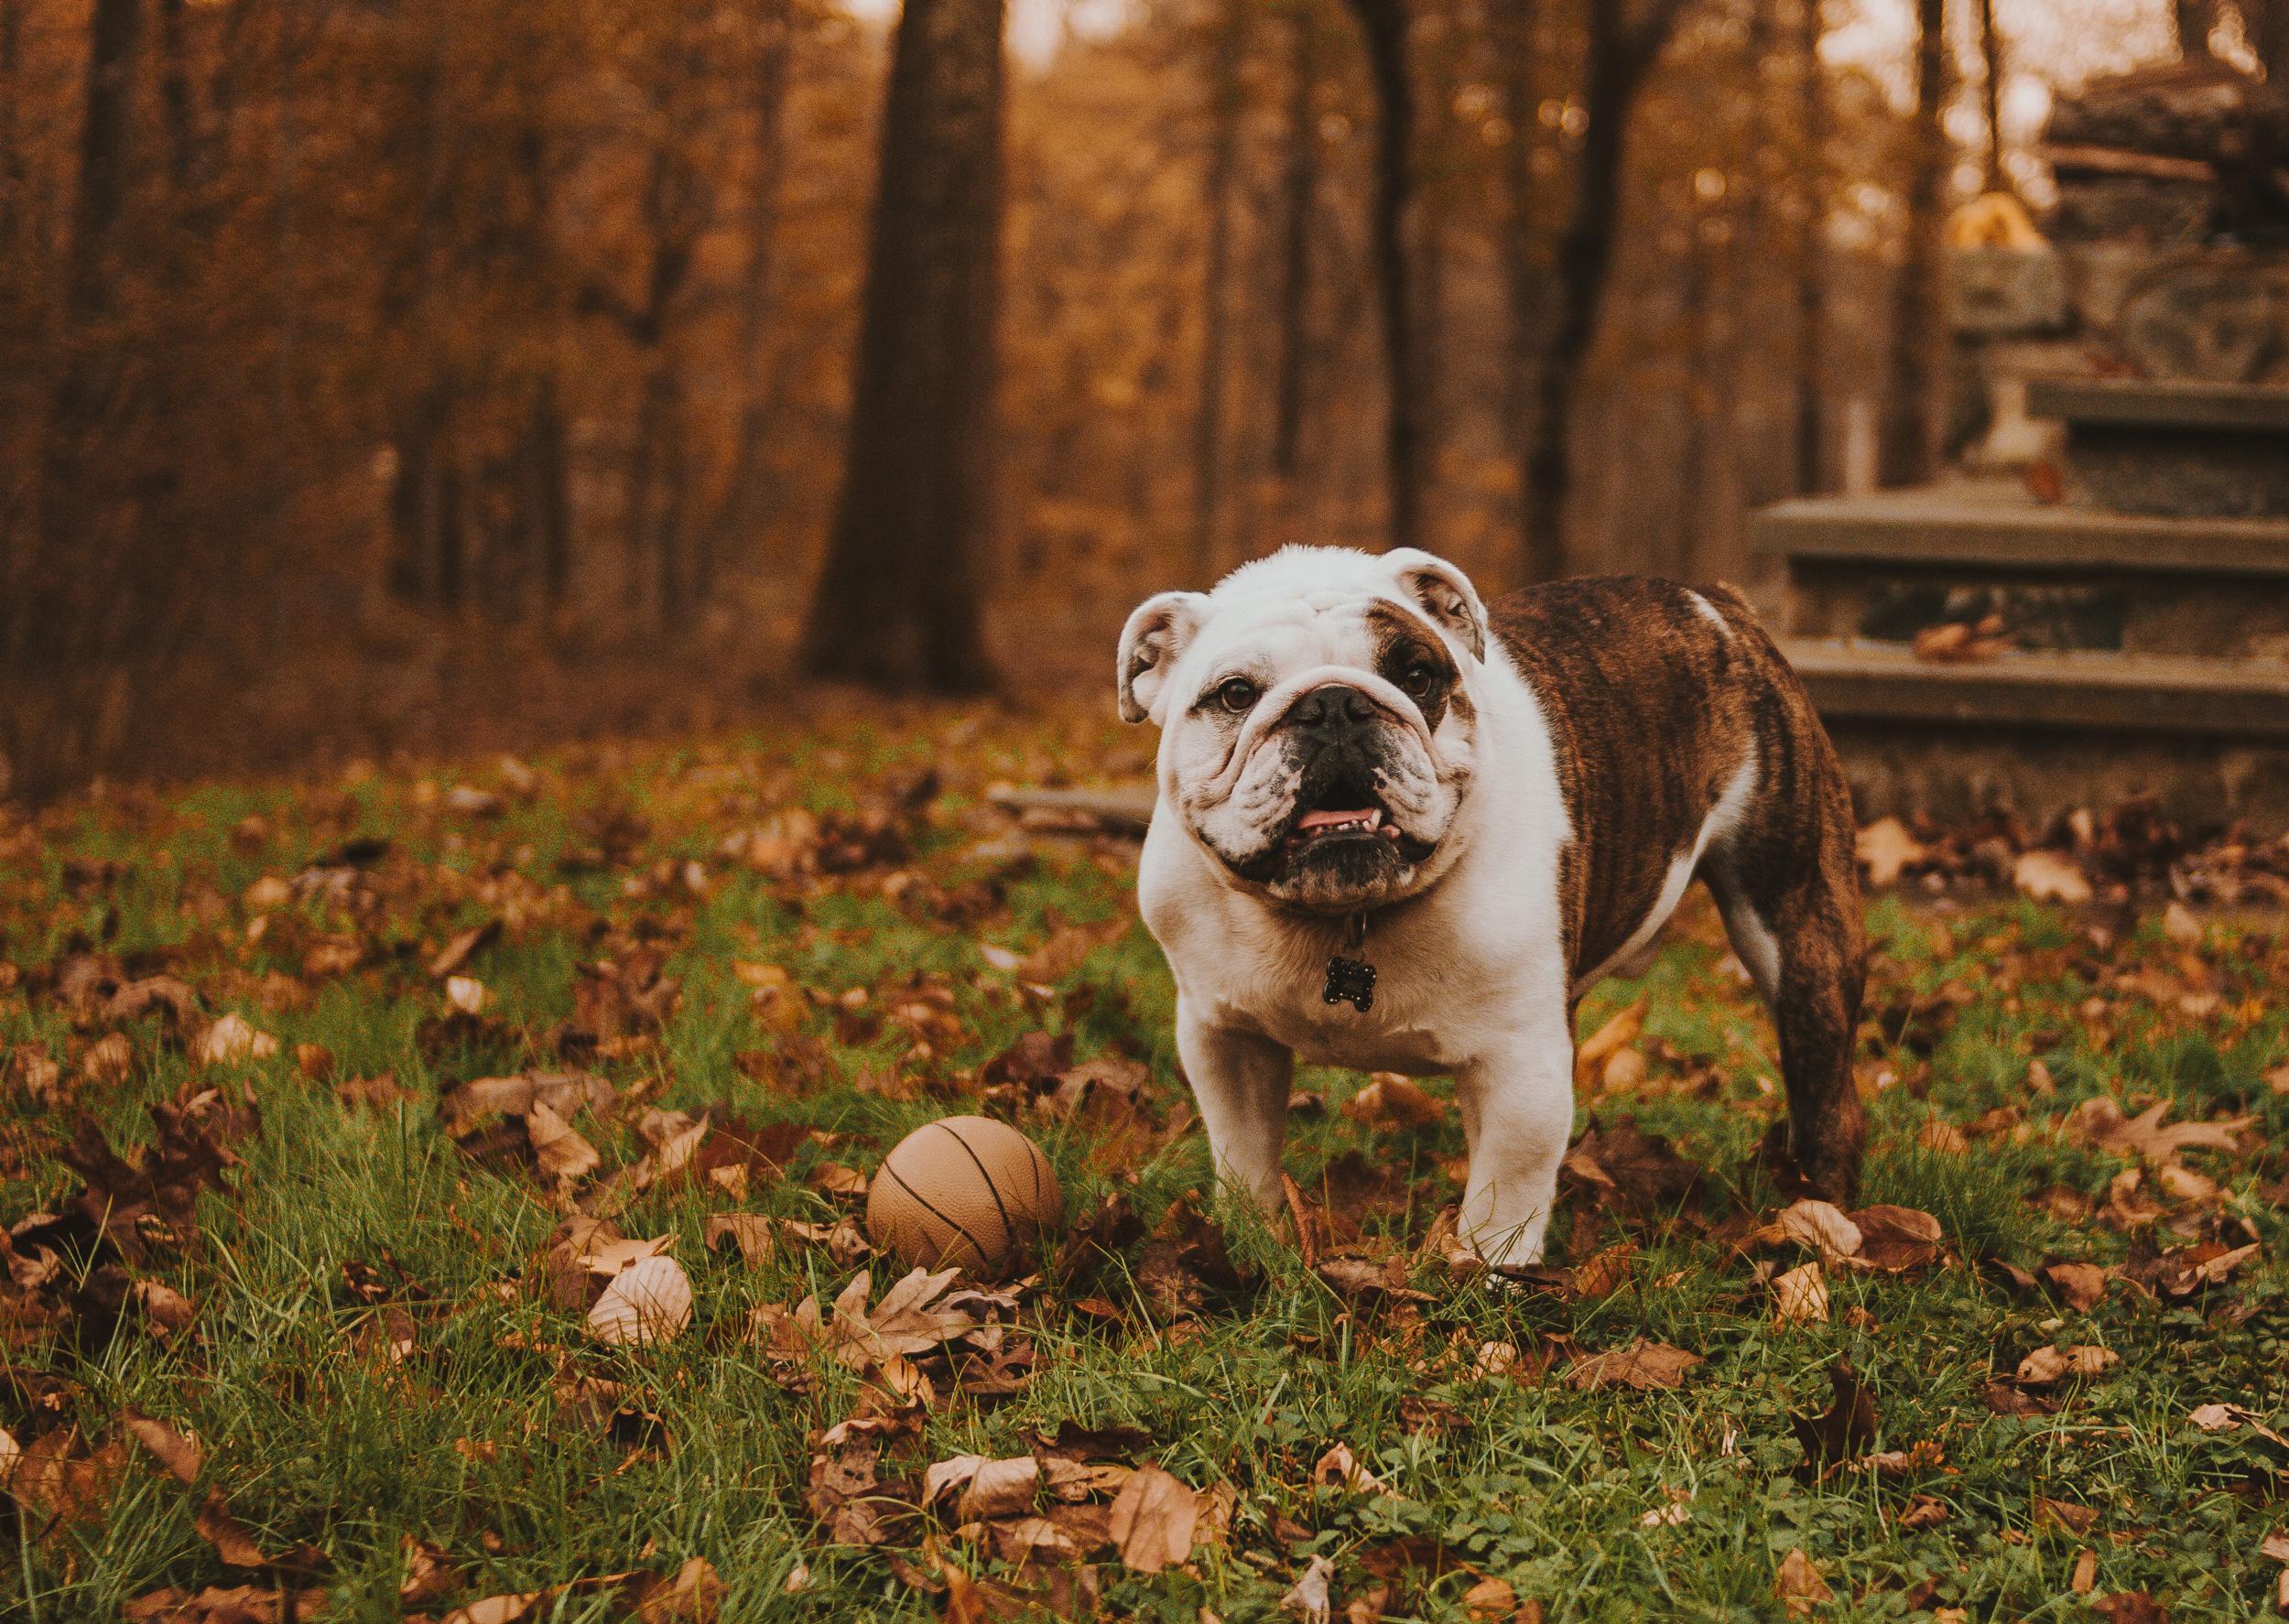 Bulldog photo by Rodolfo Sanches